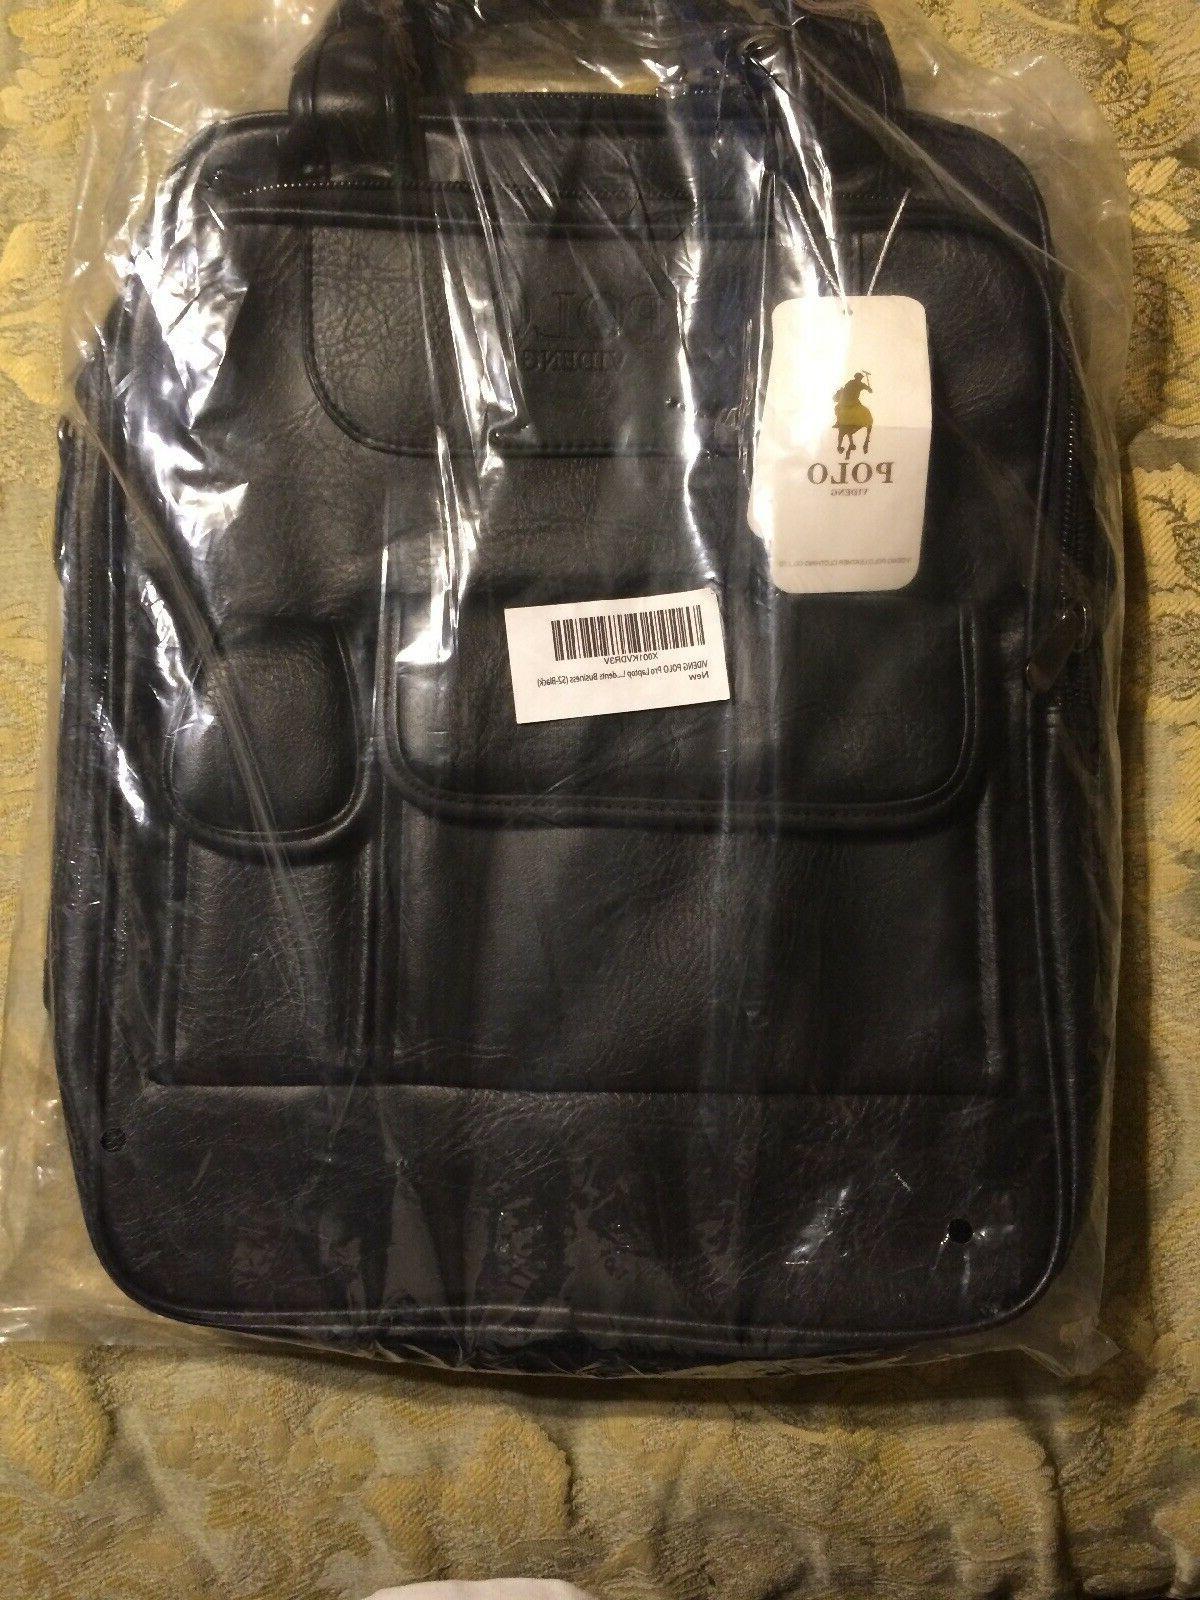 Polo VIDENG Backpack